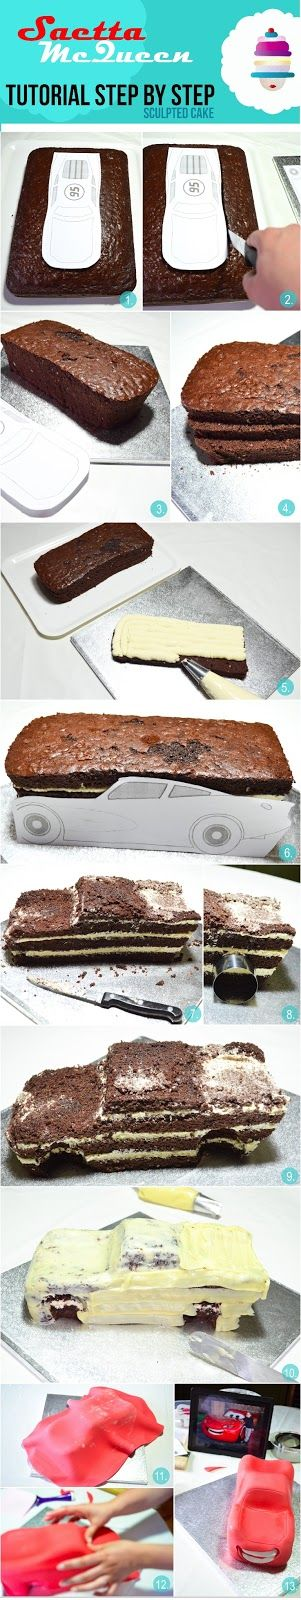 ! Dolci Creativi di Sarù - Torte decorate: Saetta McQueen {torta scolpita} + tutorial#more